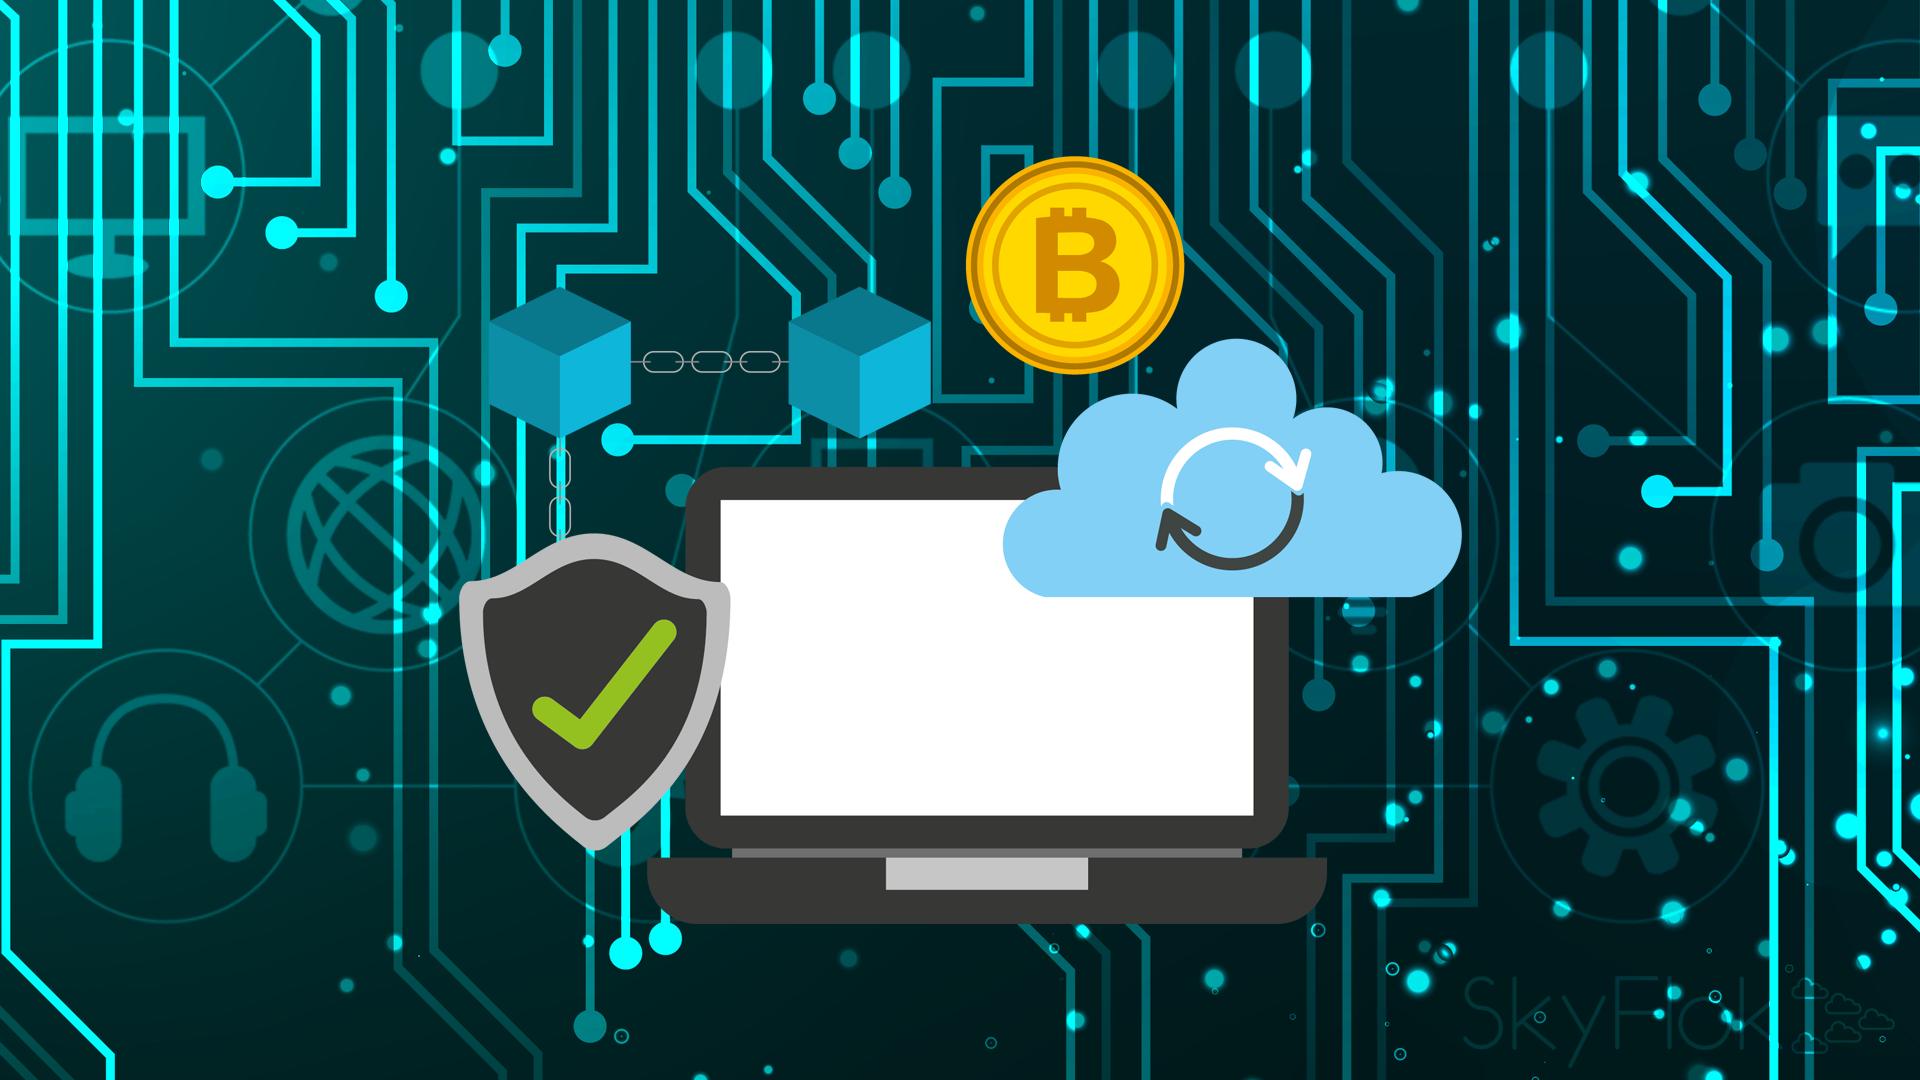 Decentralized data storage in a blockchain future